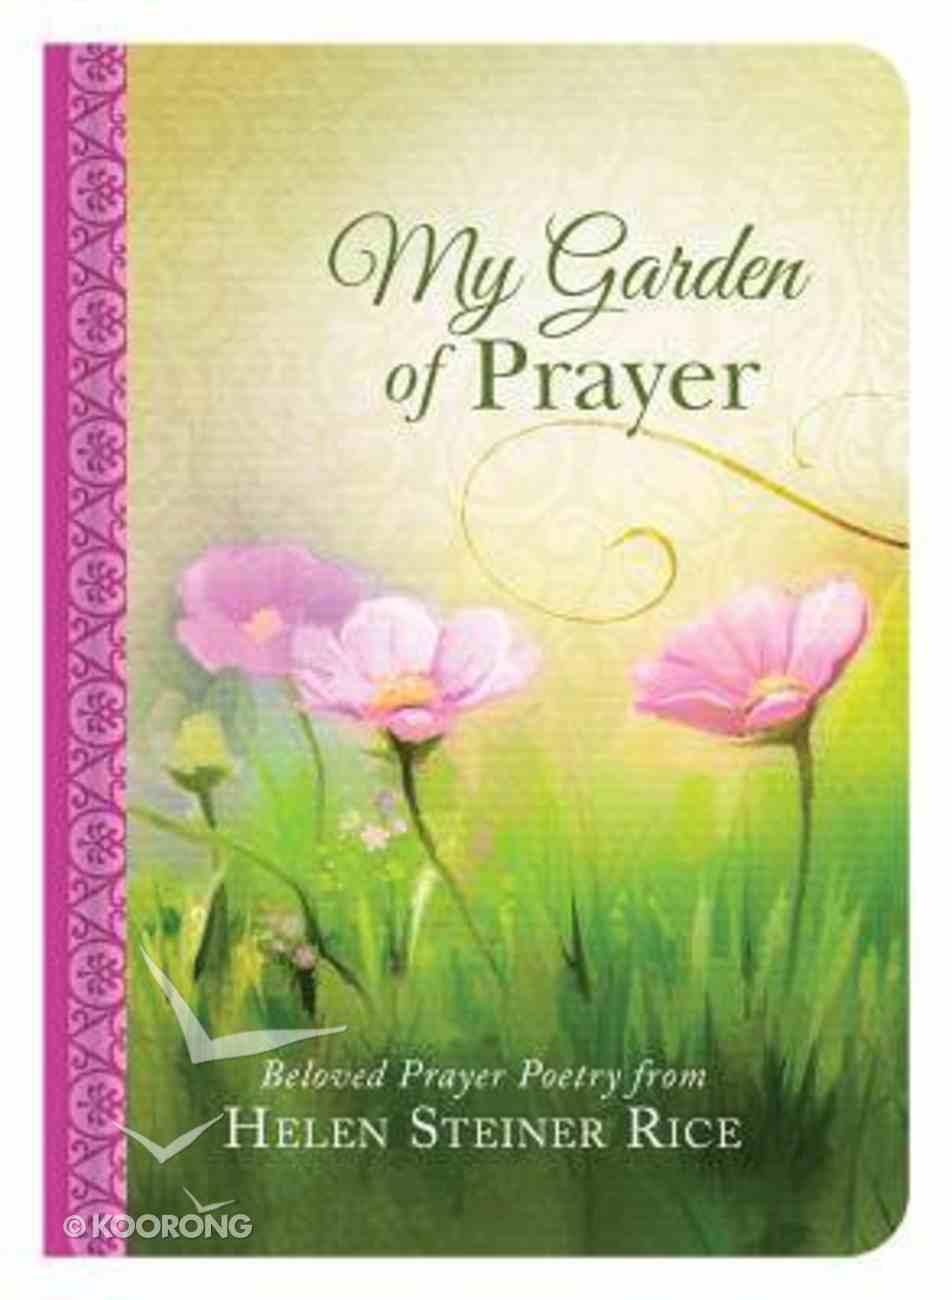 My Garden of Prayer: Beloved Prayer Poetry From Helen Steiner Rice Hardback